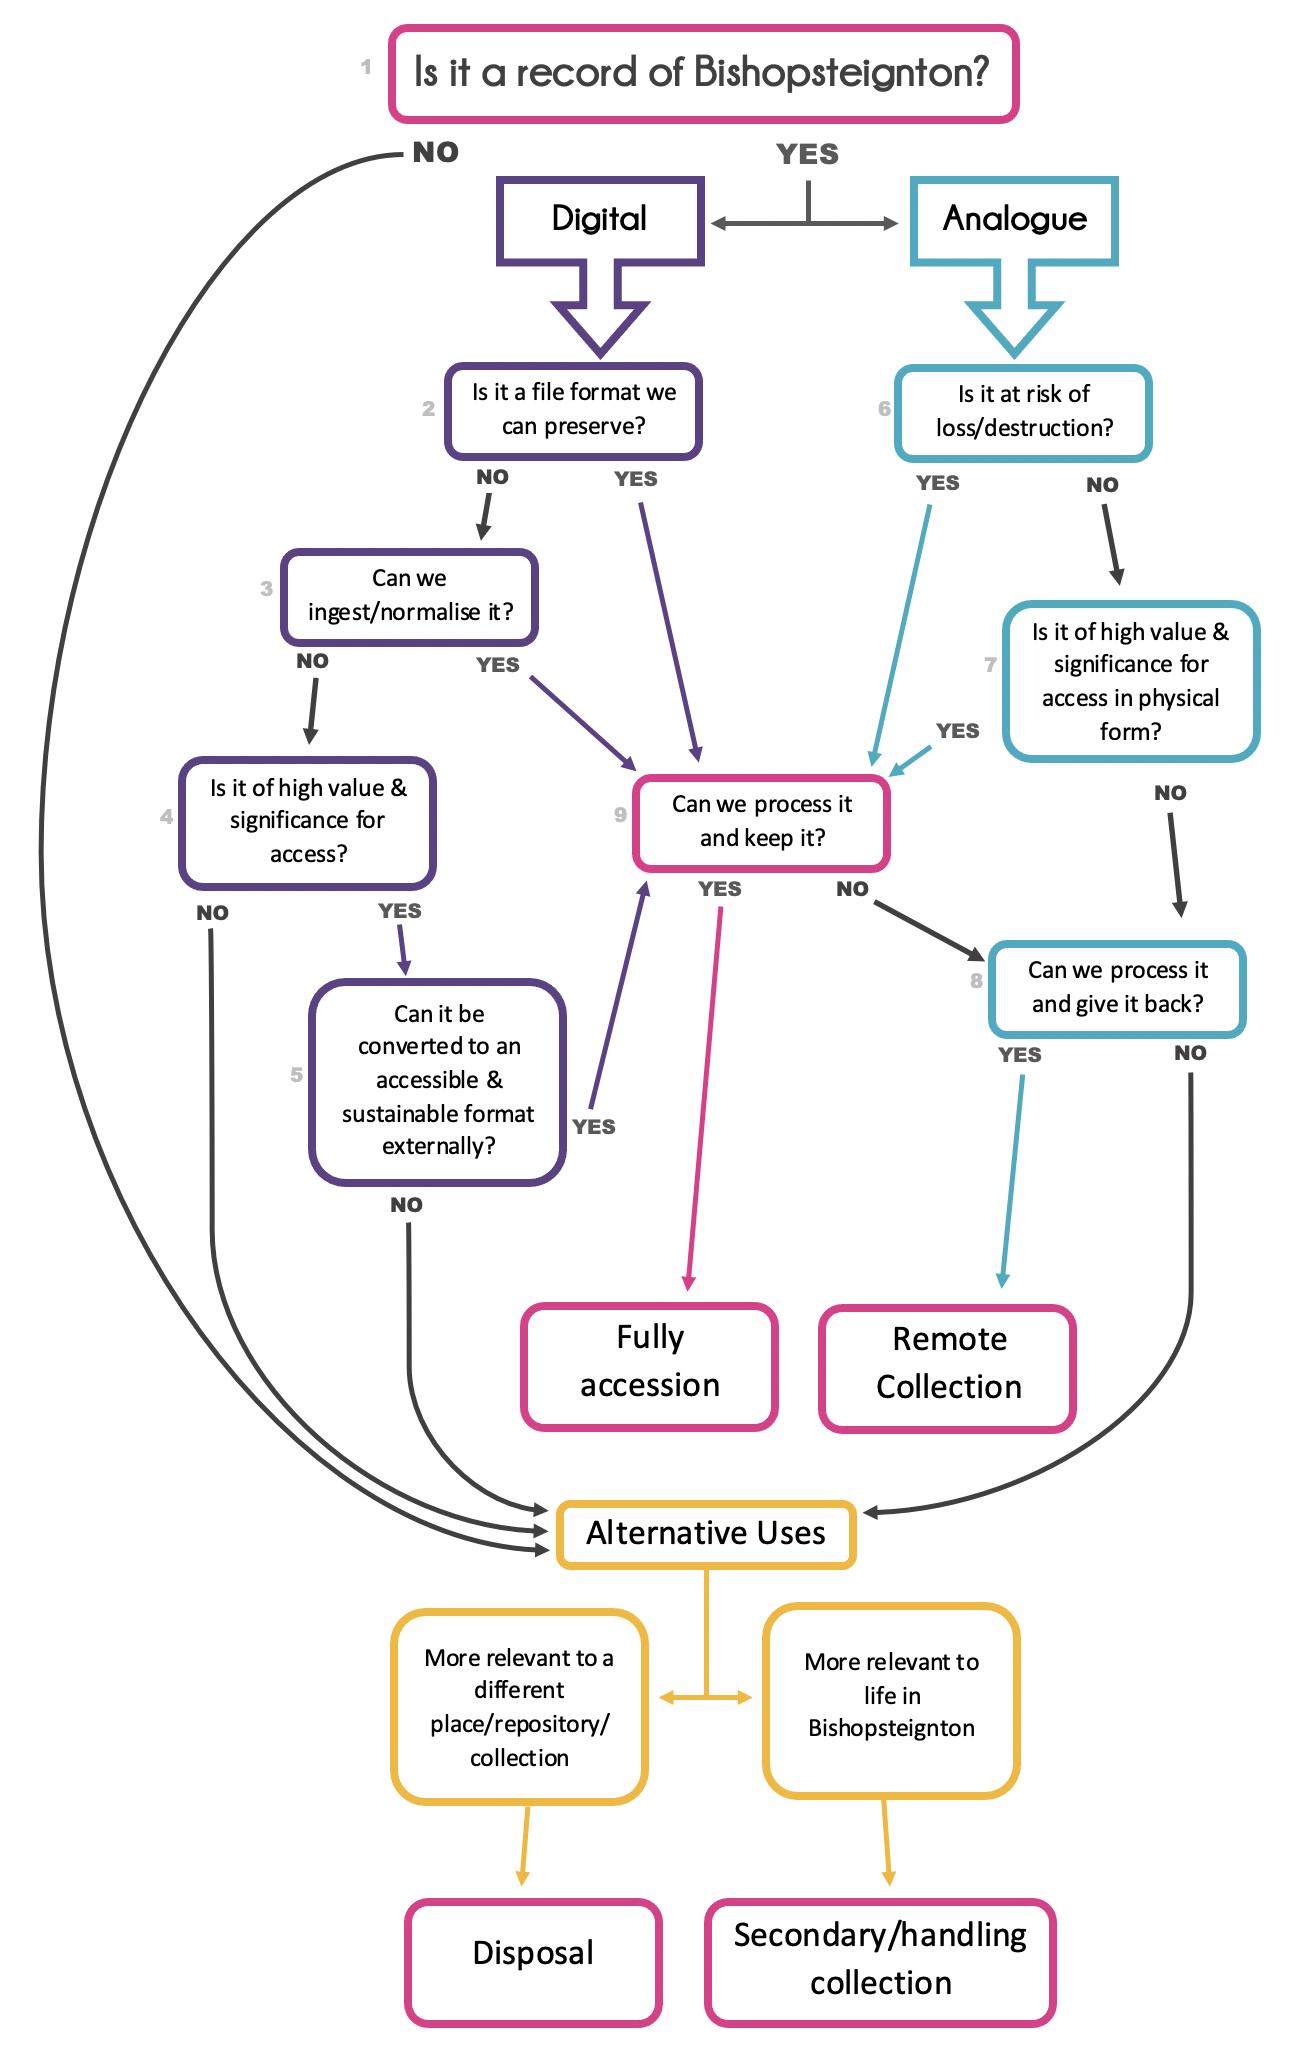 Appraisal decision tree version 3